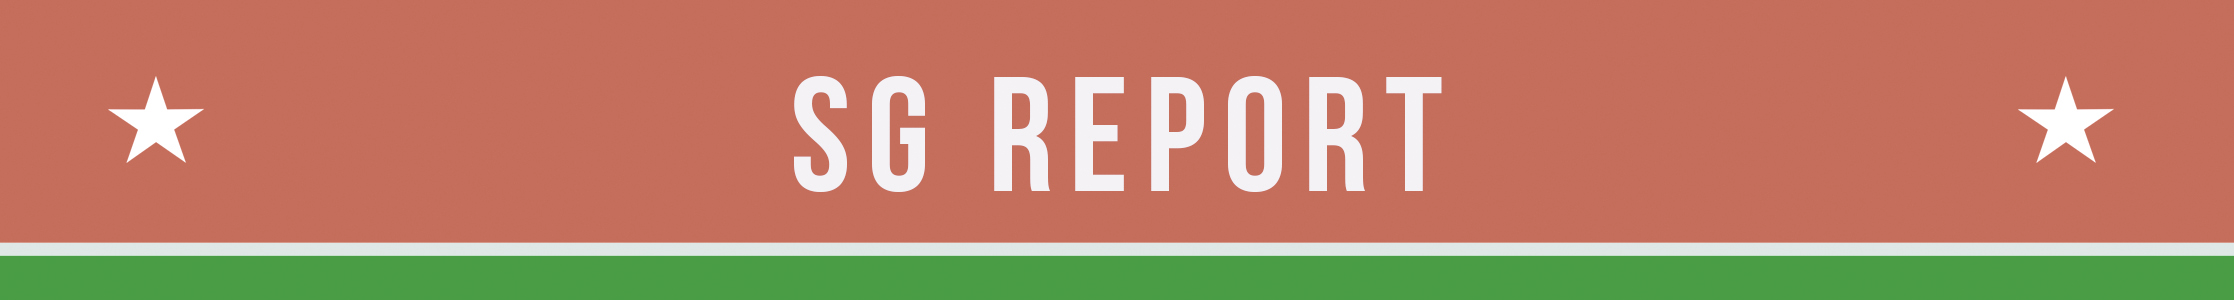 SG Report: 1/22/18